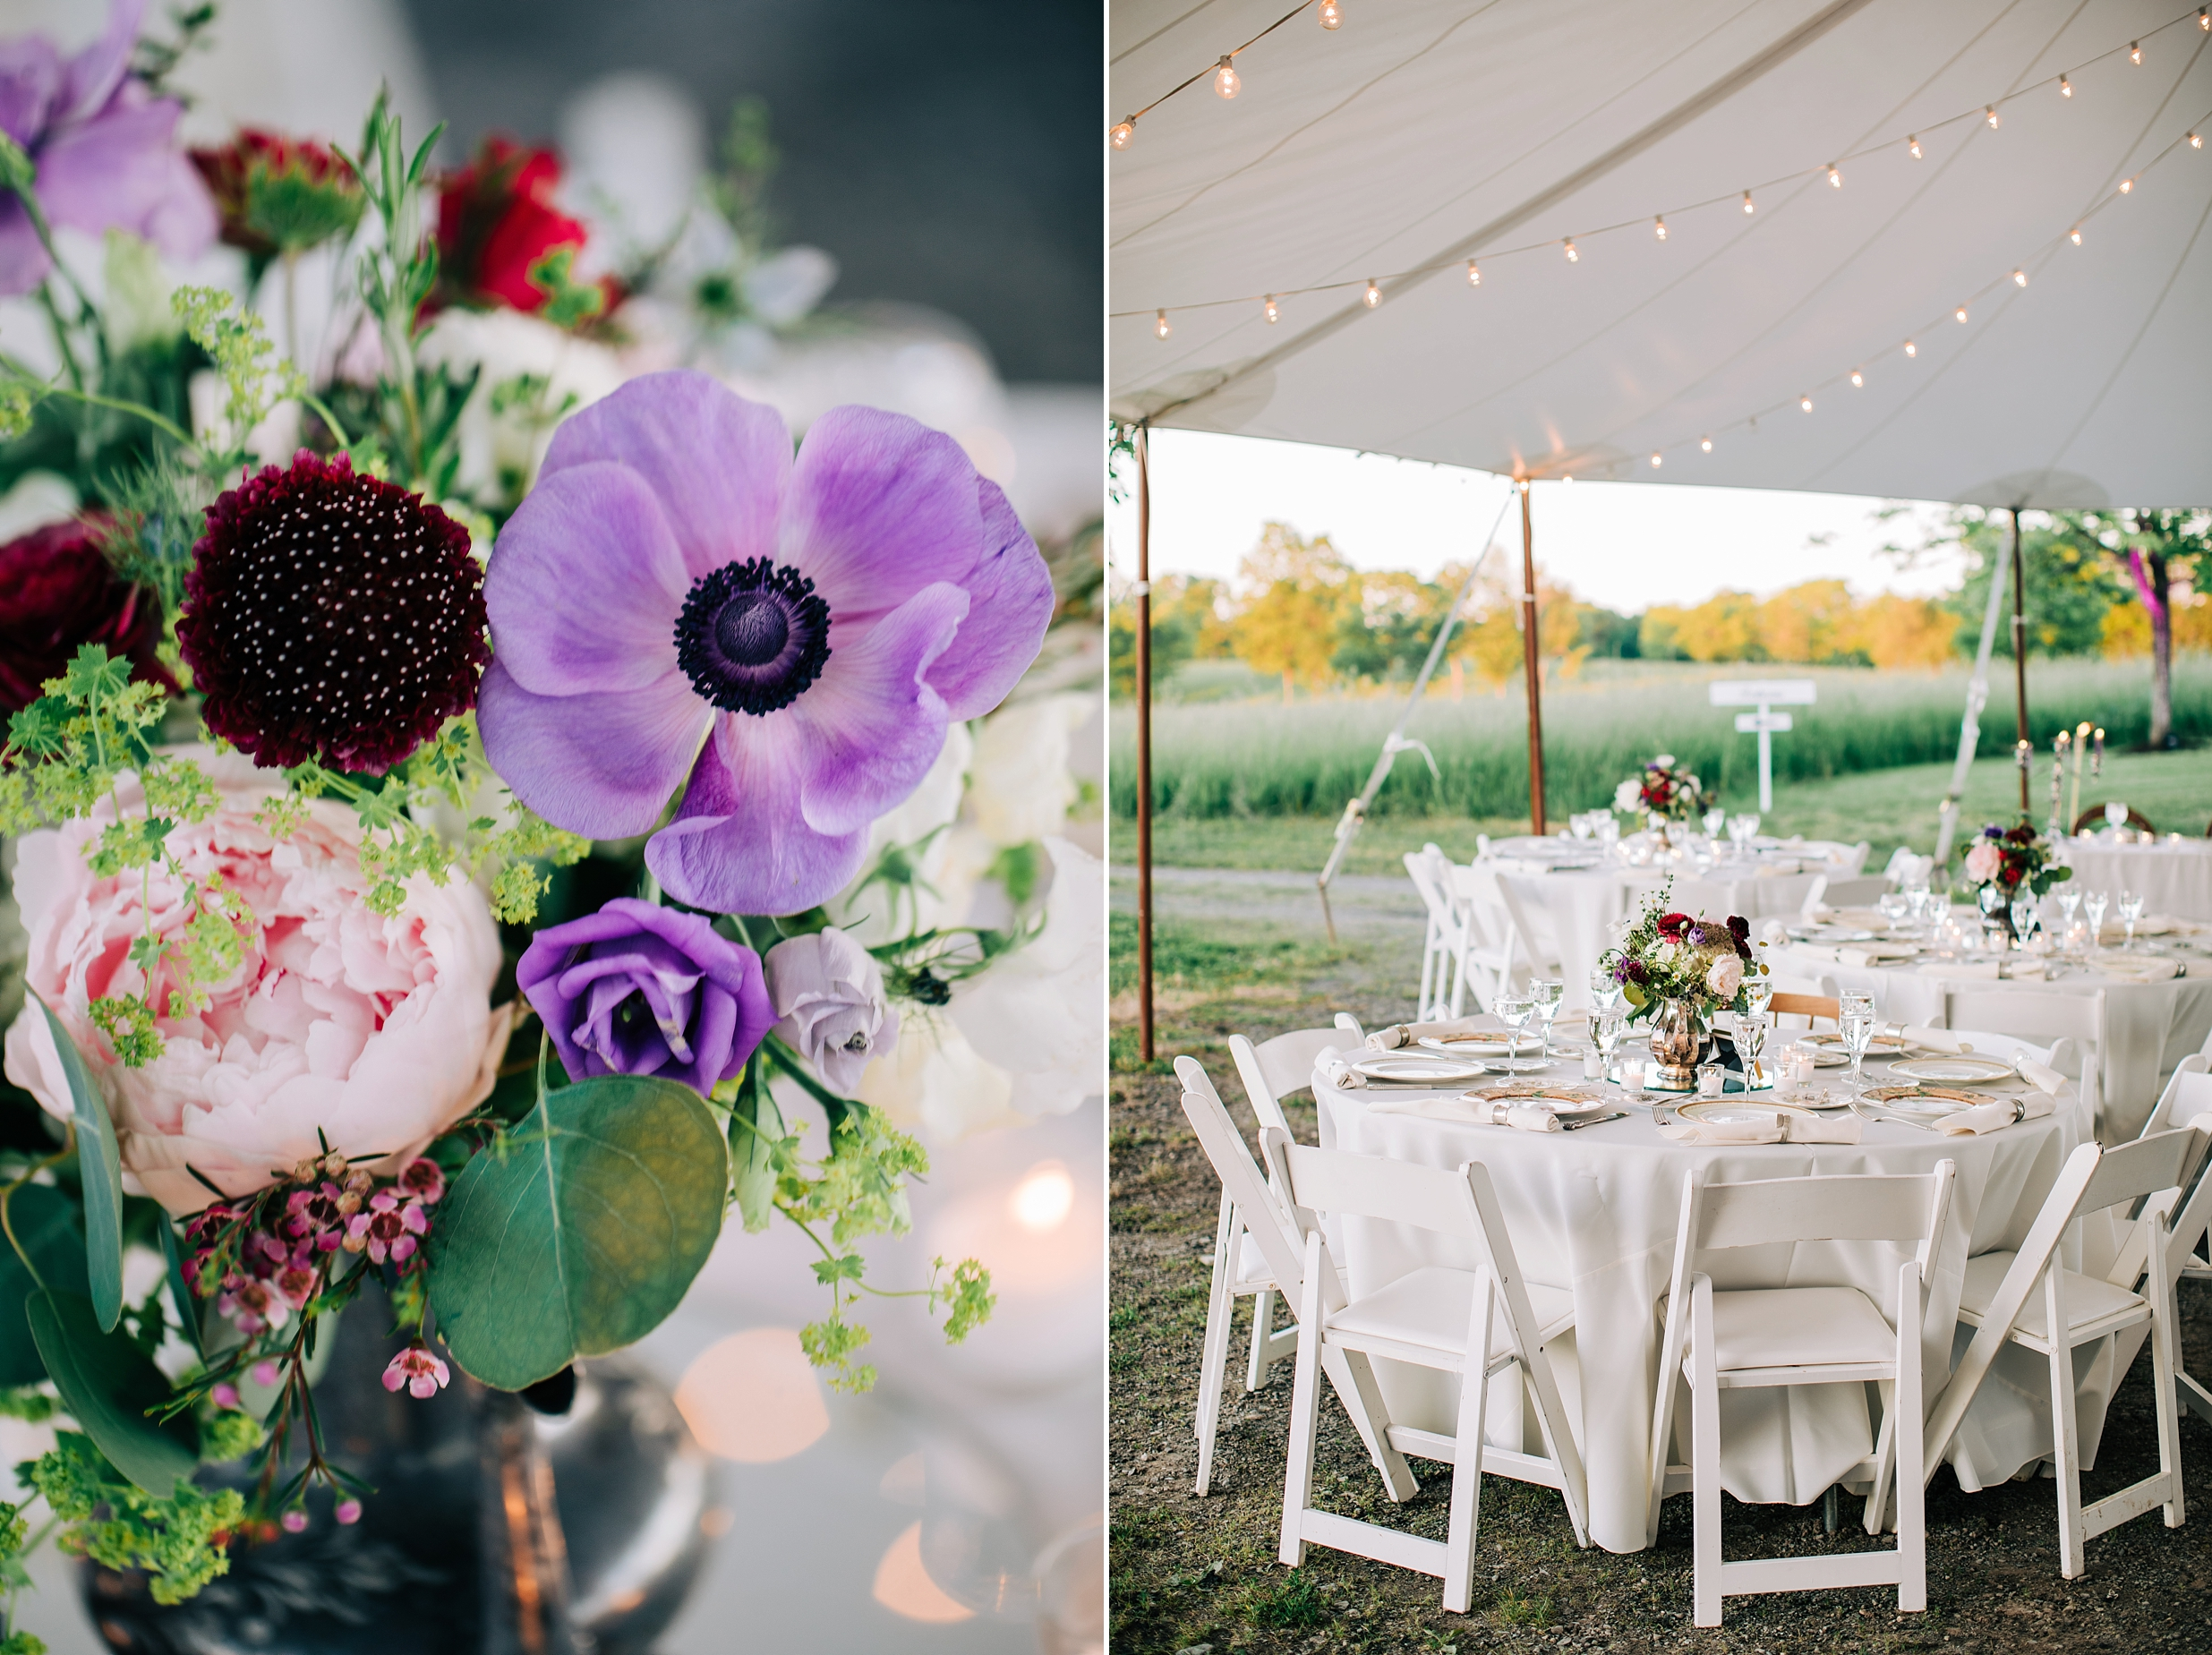 historic-upstate-ny-wedding-church-backyard-photographer_0040.jpg